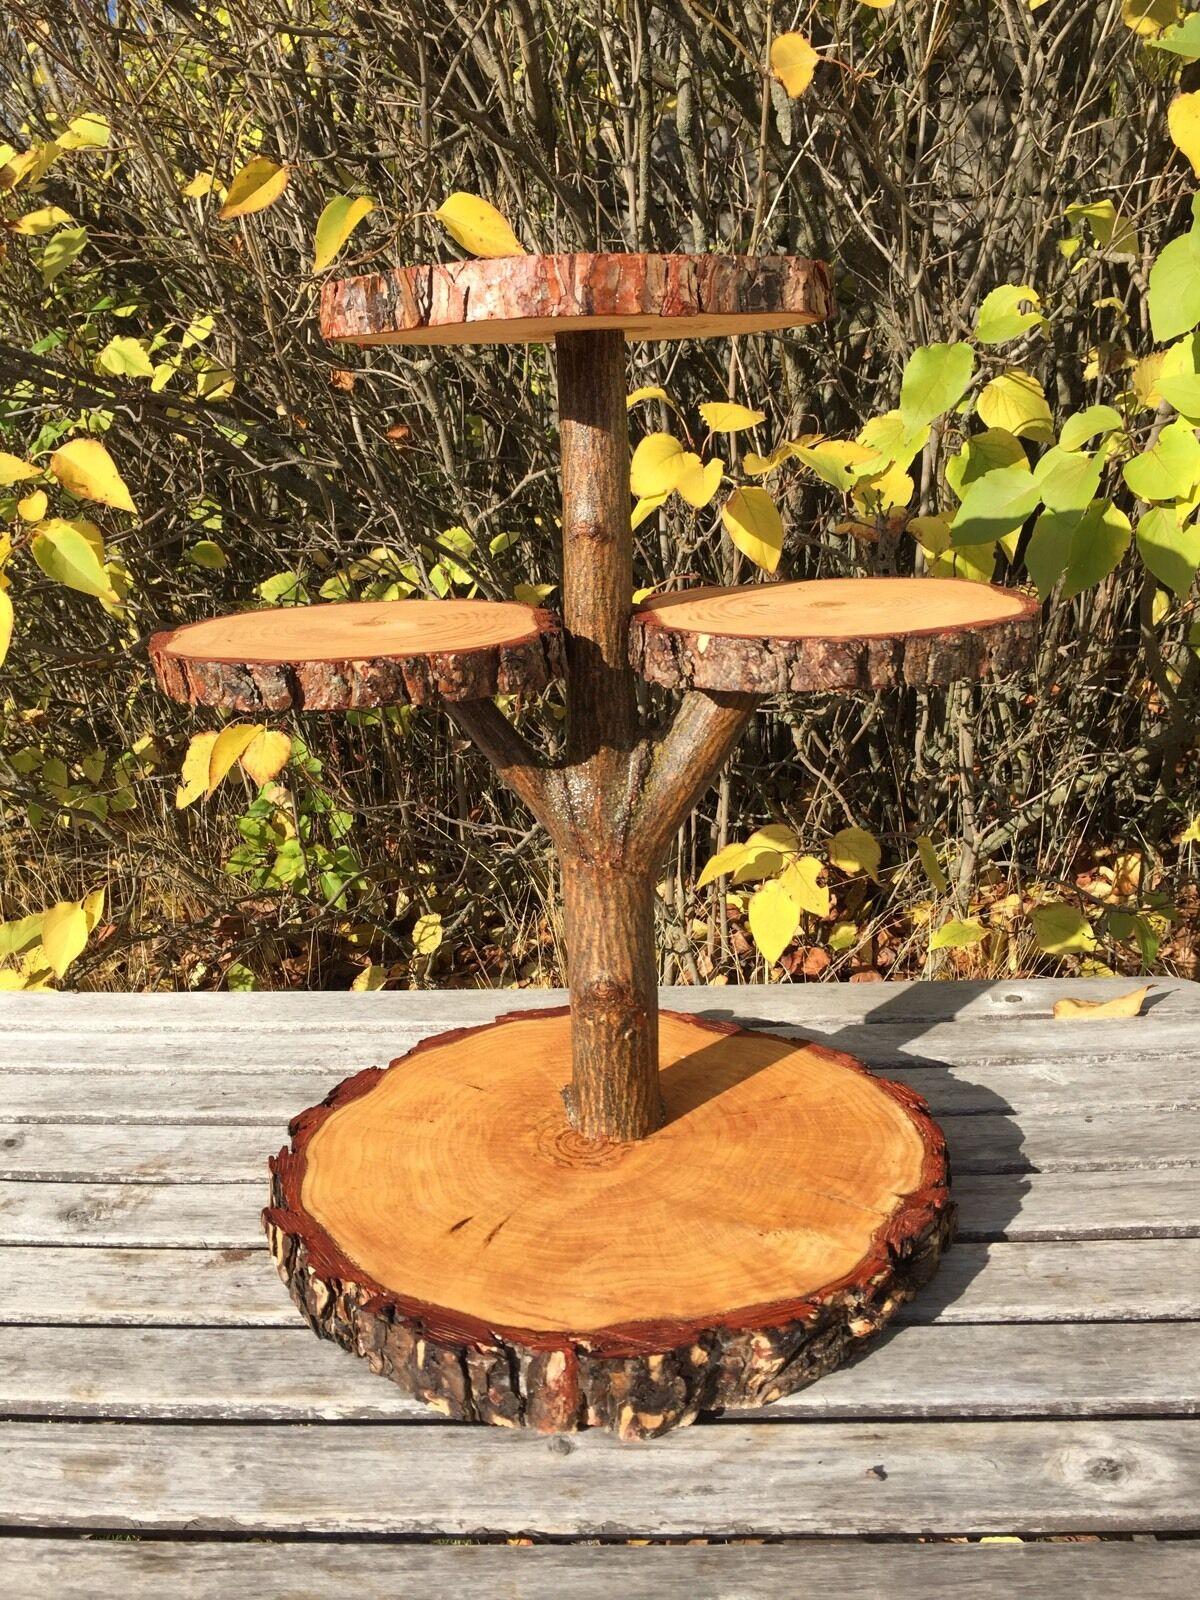 Pine Log Wood Rustic Cake Pie 40 Cupcake Stand Wedding party shower 4 tierot